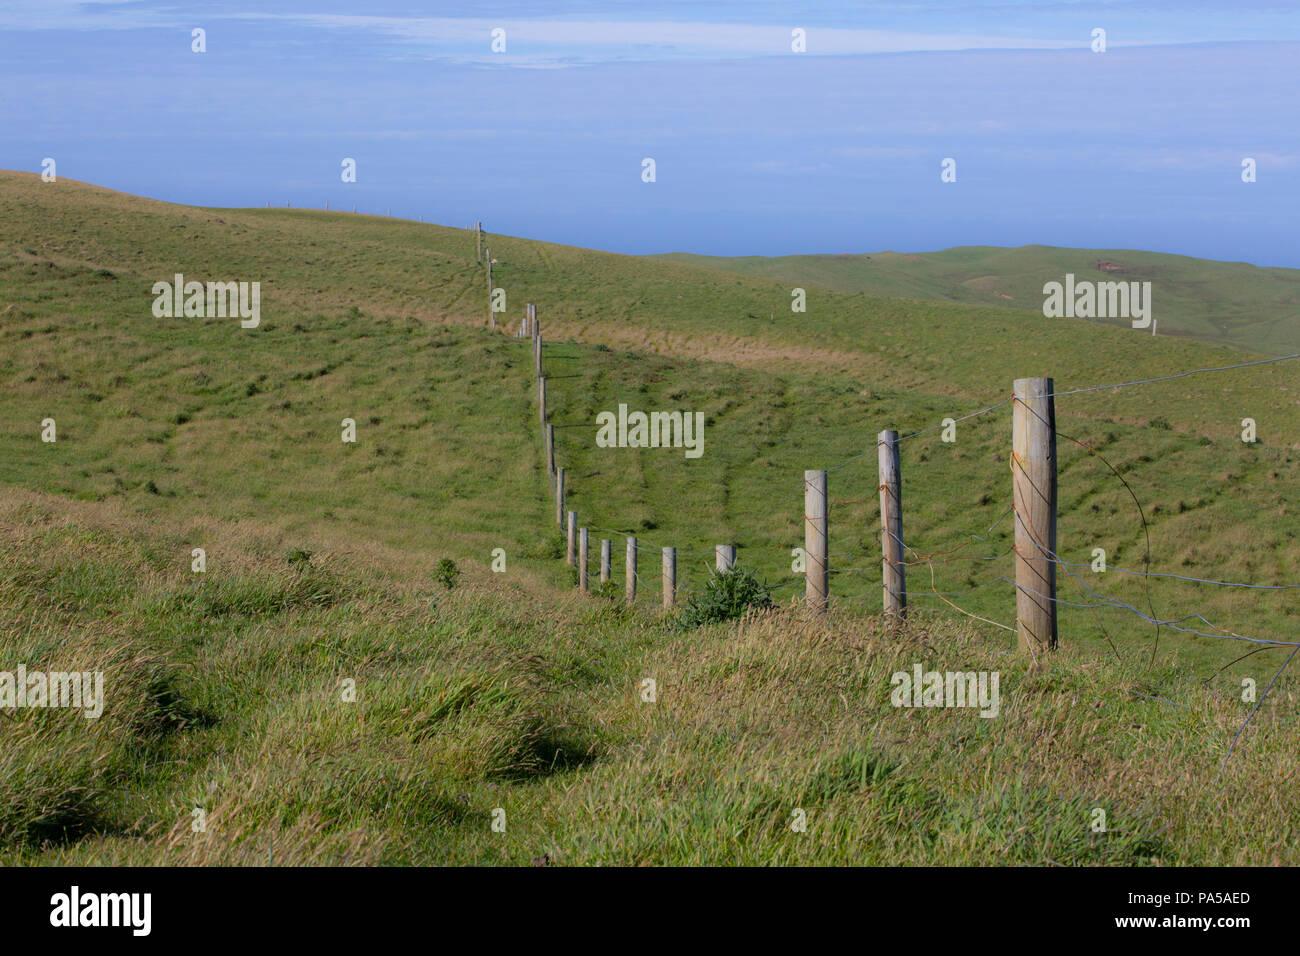 Farm fence on Pitt Island, Chatham Islands - Stock Image